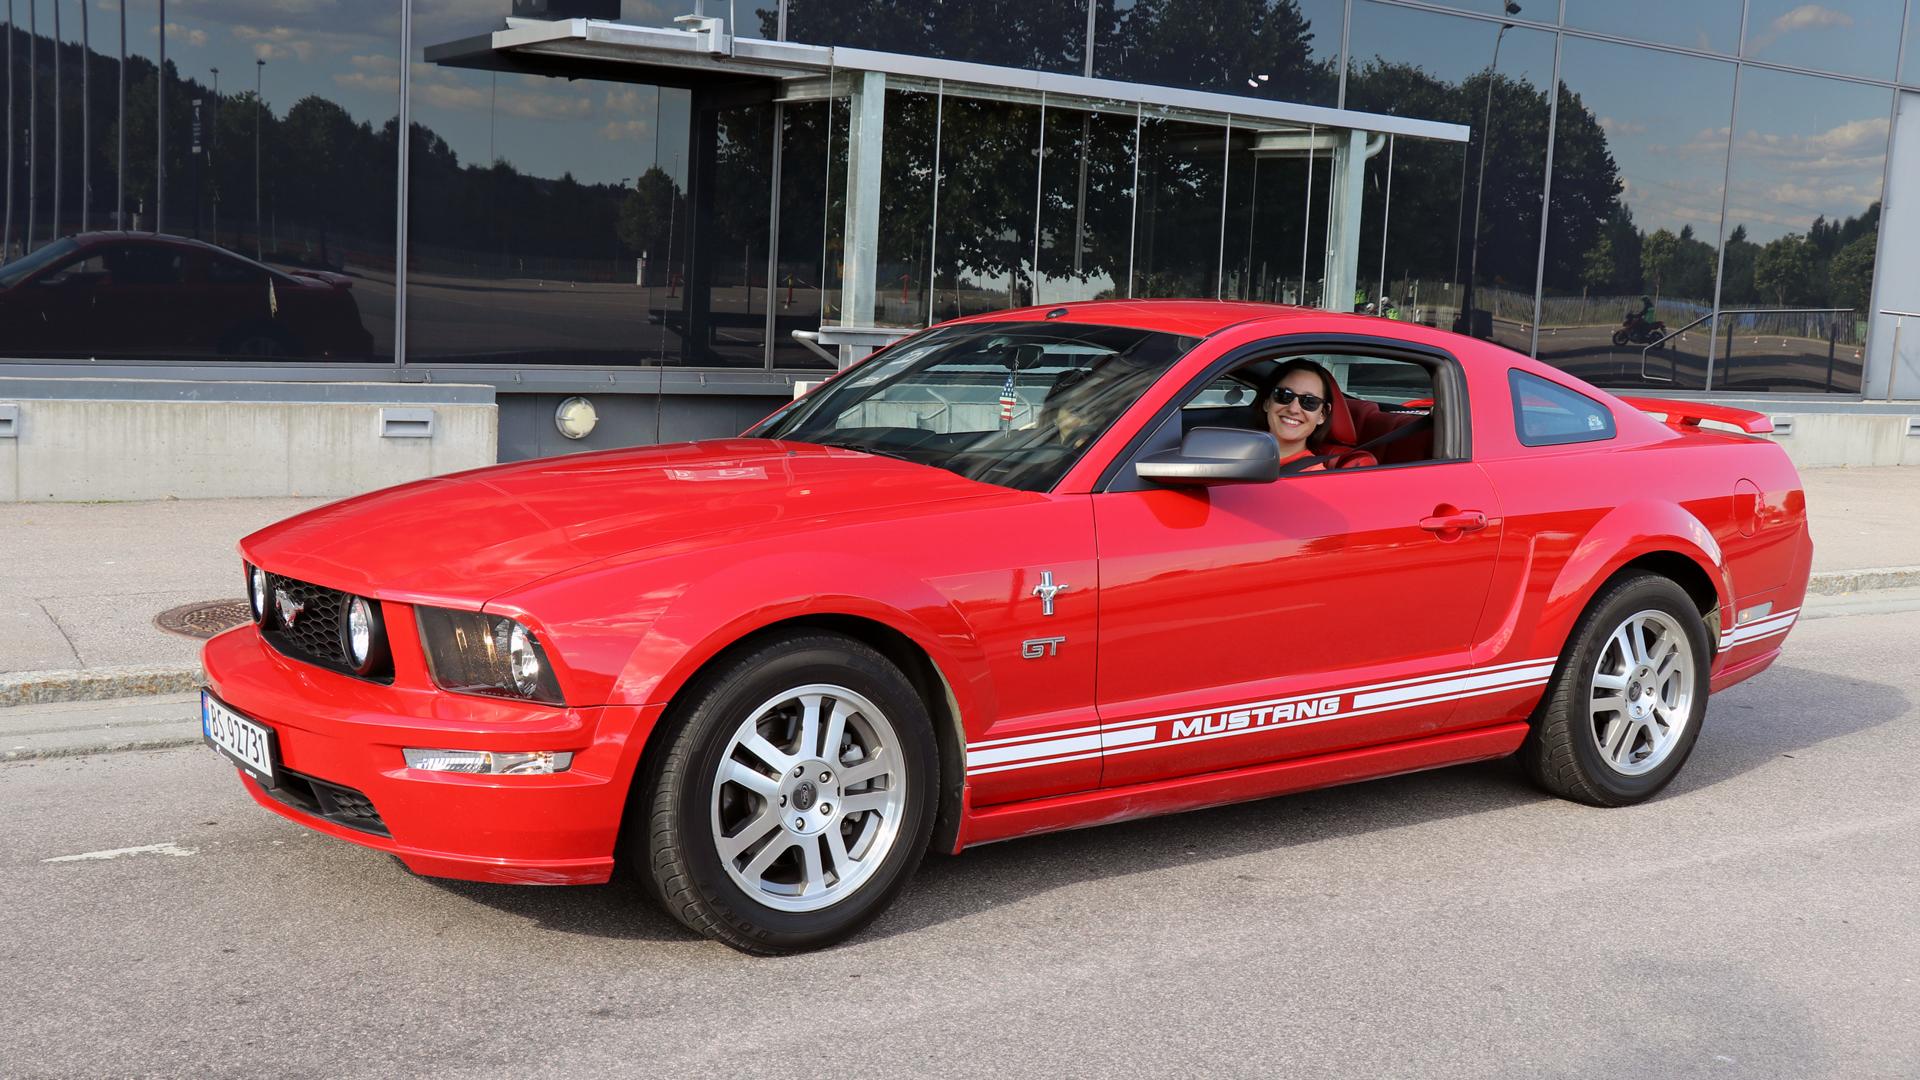 265-2005 Ford Mustang GT 01. Eier- medlem 265 Niko